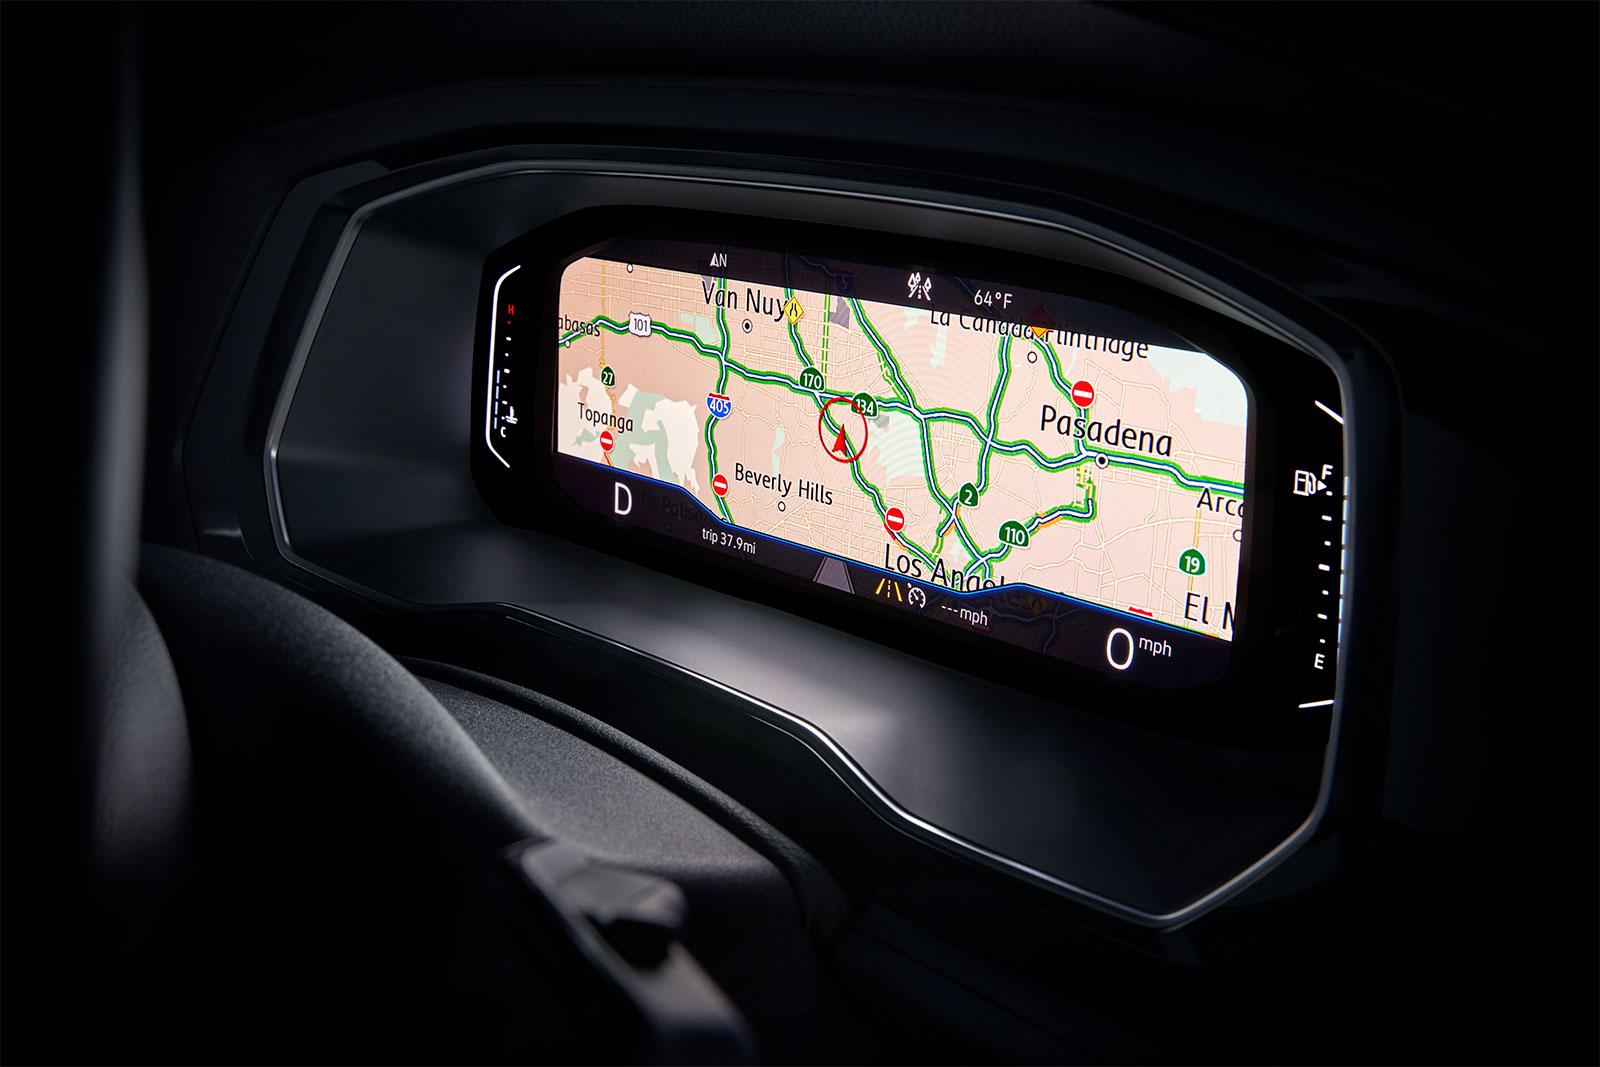 2020 Volkswagen Jetta Information Disaplay